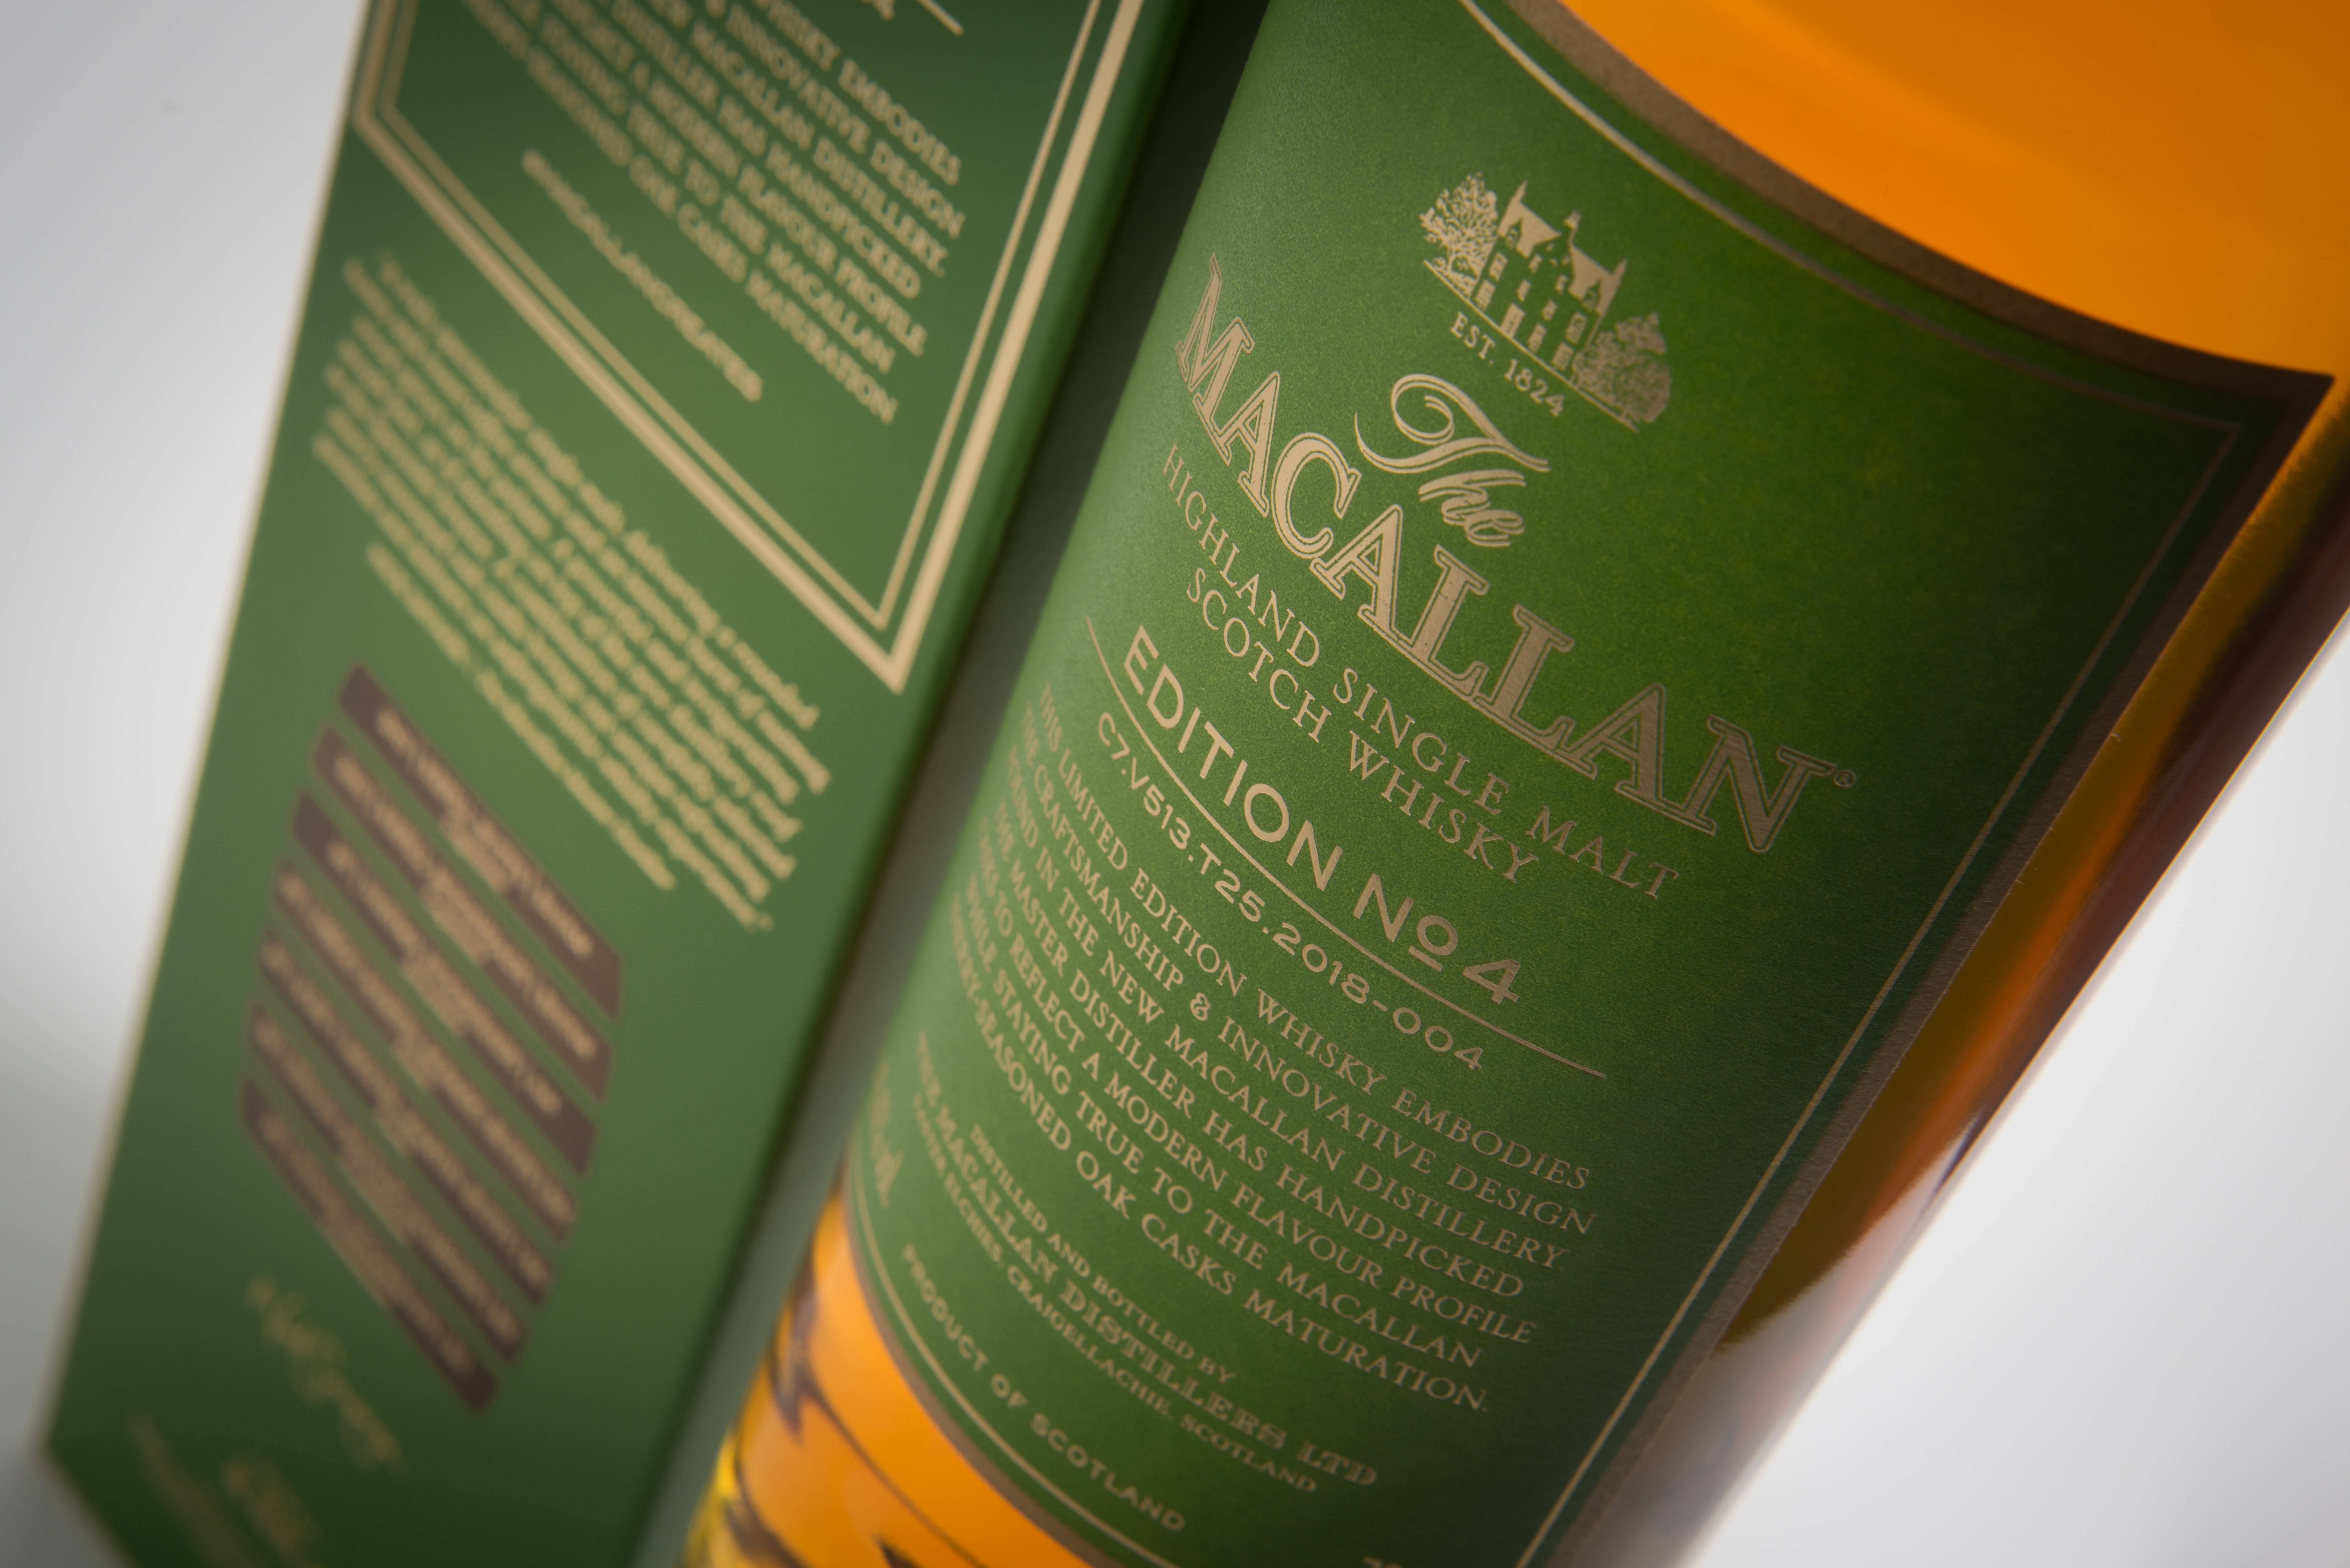 The Macallan Edition No. 4 Whisky